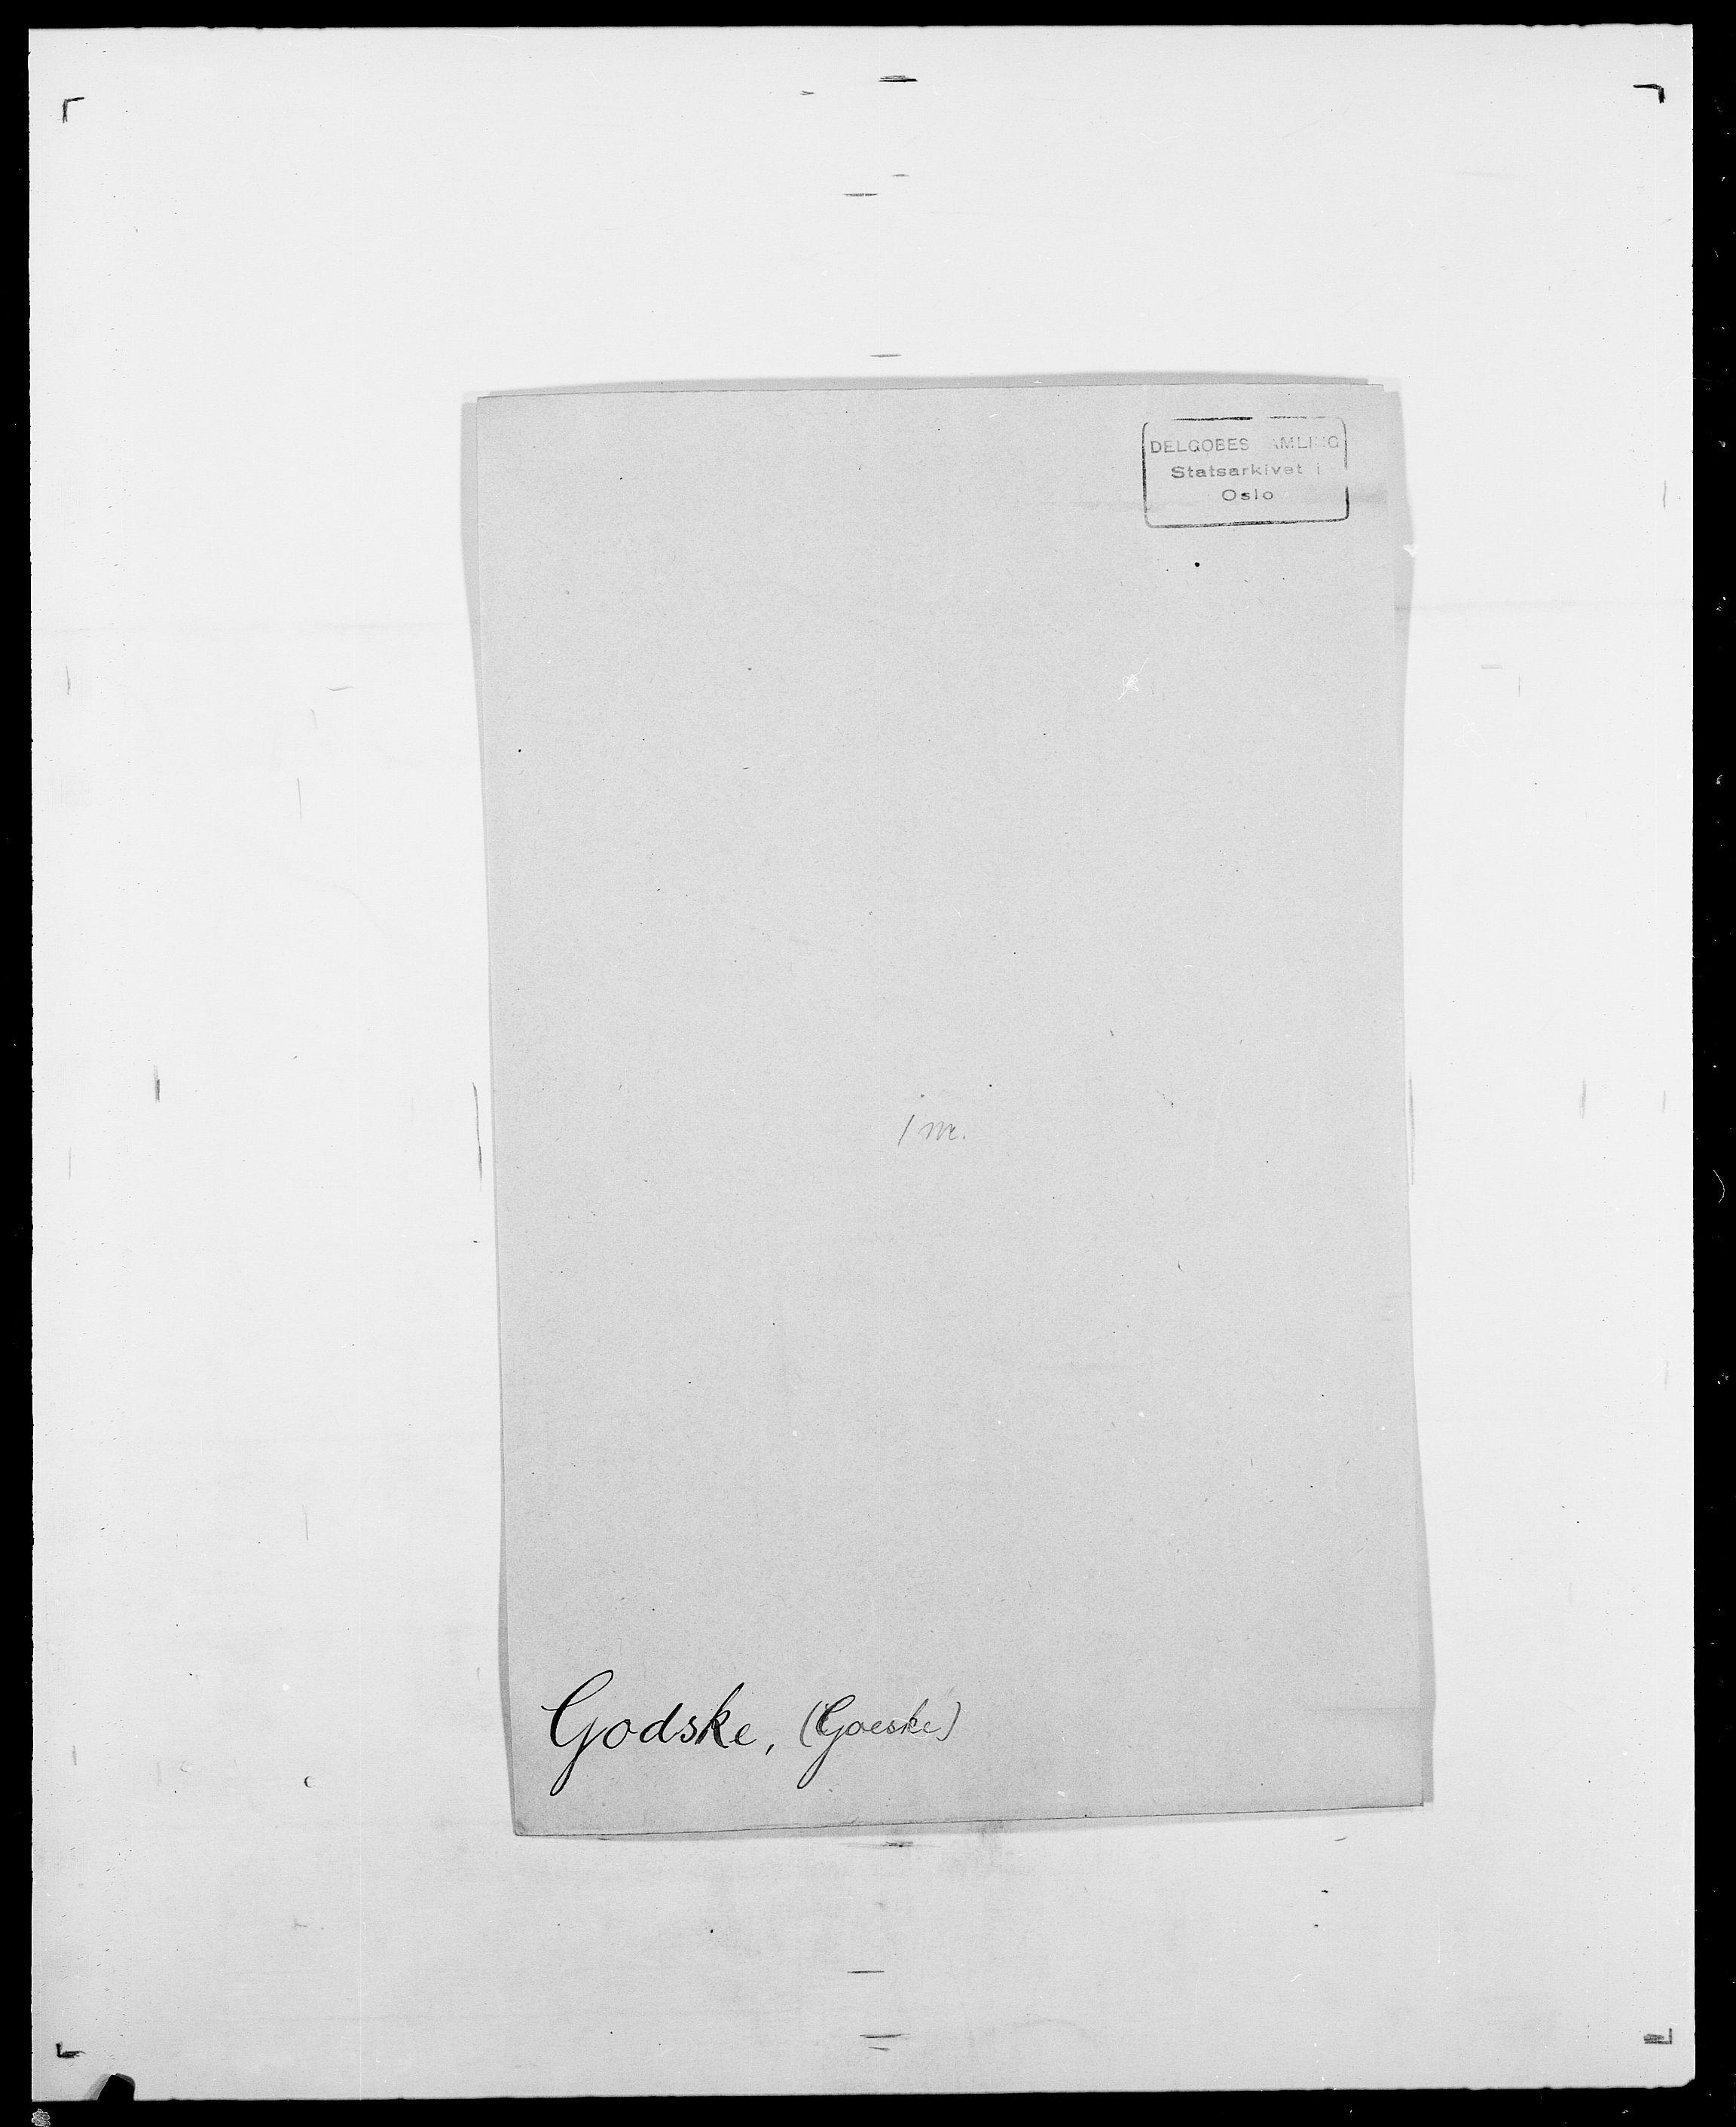 SAO, Delgobe, Charles Antoine - samling, D/Da/L0014: Giebdhausen - Grip, s. 363